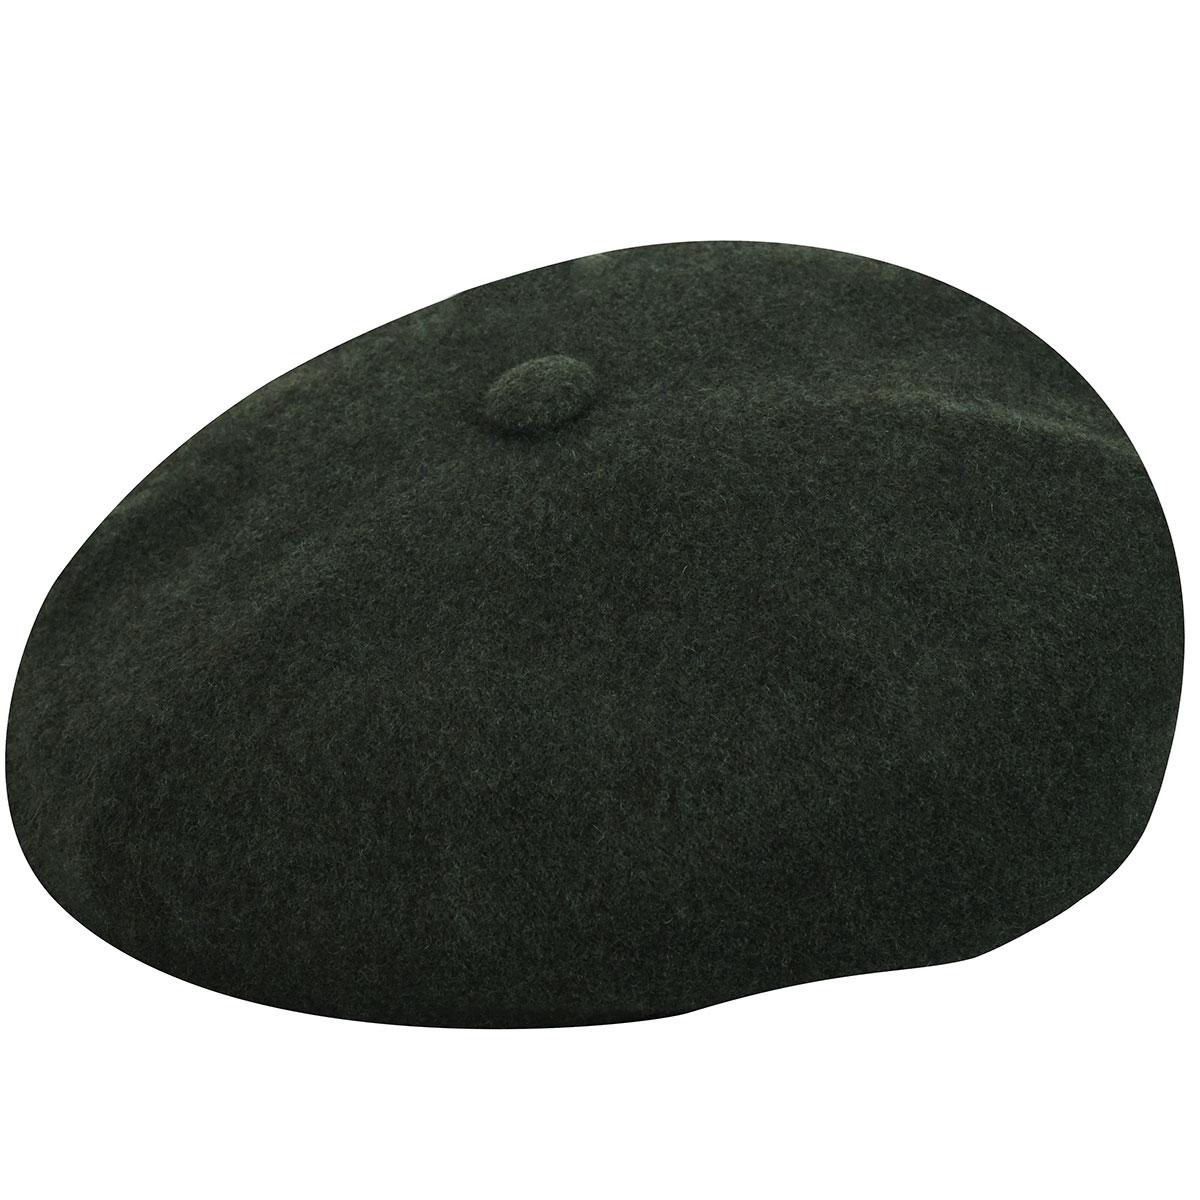 1960s – 70s Style Men's Hats Wool Hawker $60.00 AT vintagedancer.com